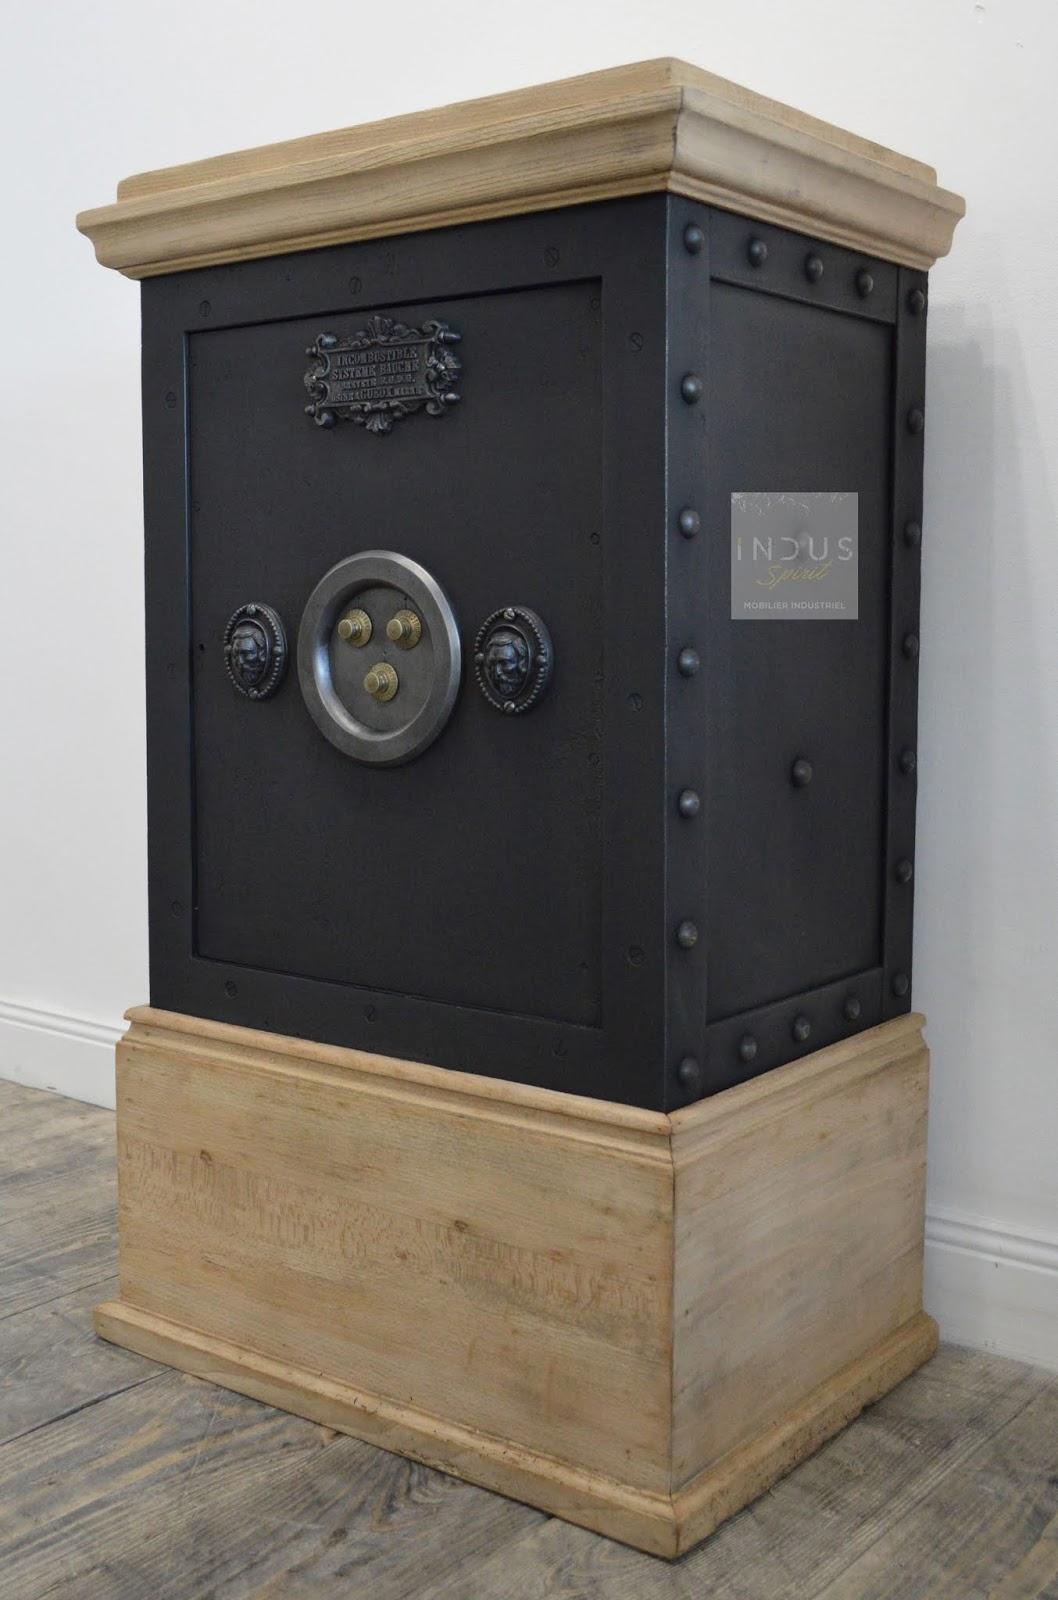 ancien coffre fort bauche. Black Bedroom Furniture Sets. Home Design Ideas